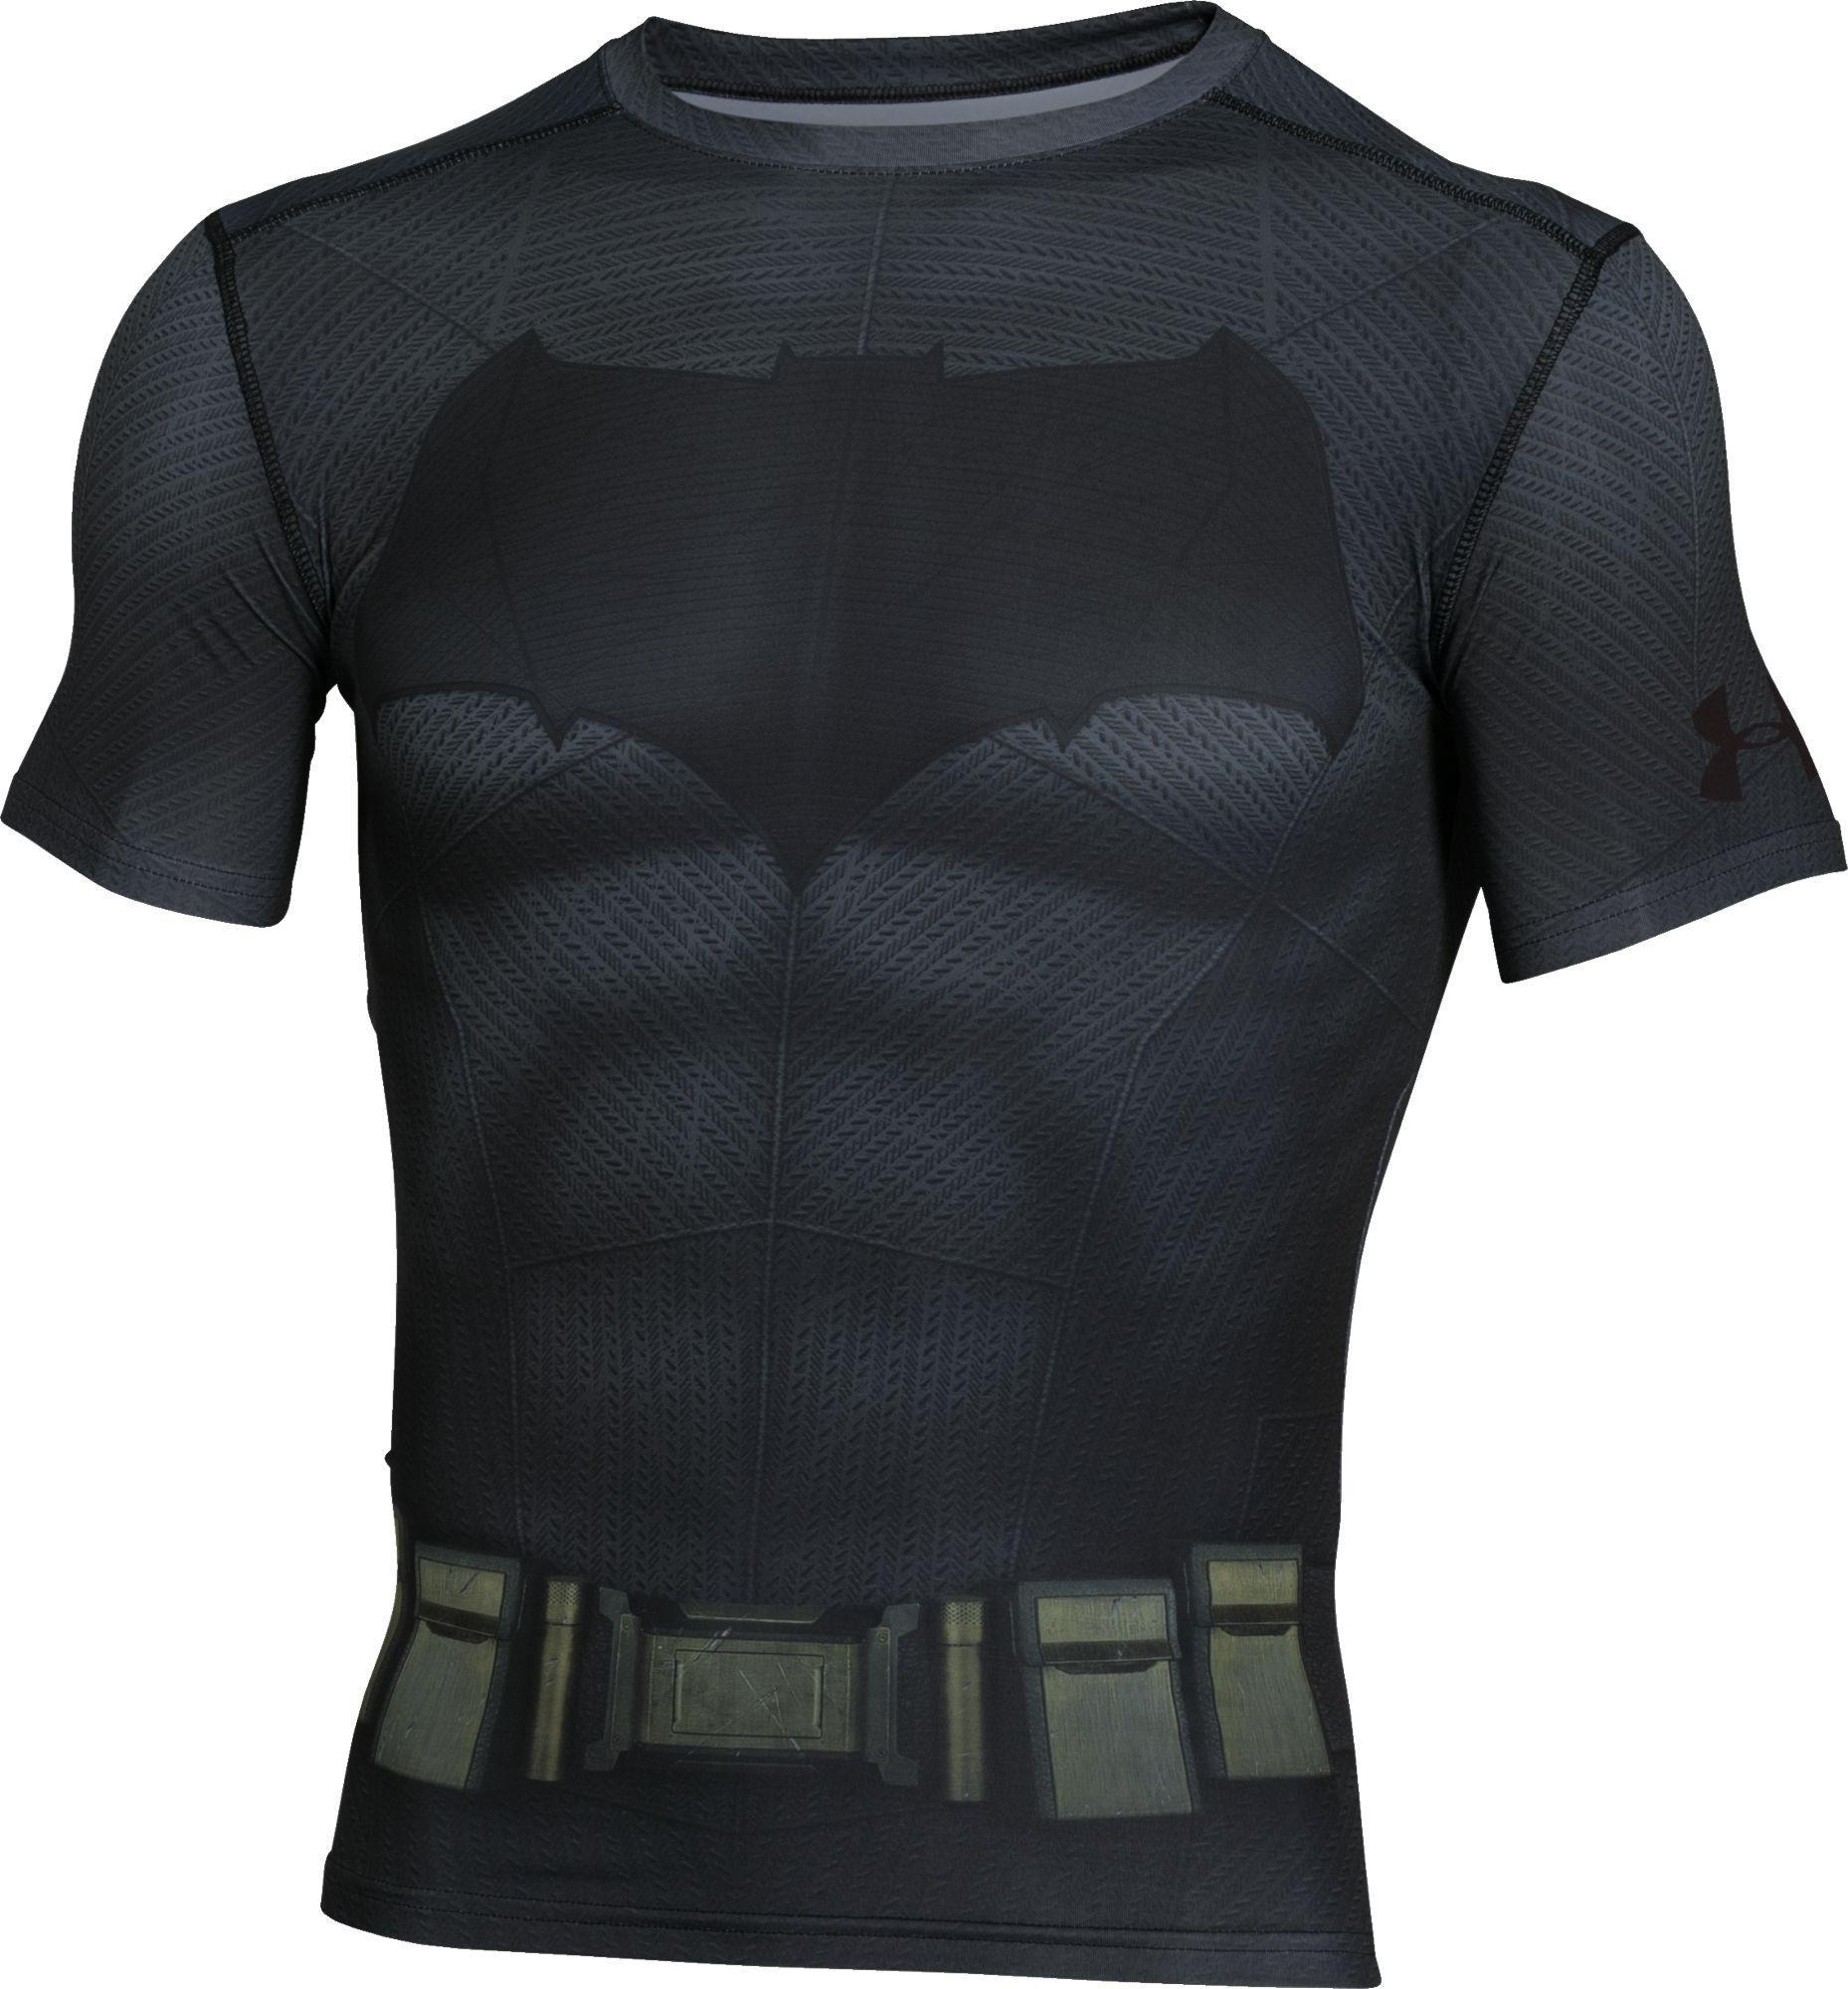 bfc67df6 Under Armour Alter Ego Batman Compression T-shirt in Black for Men ...